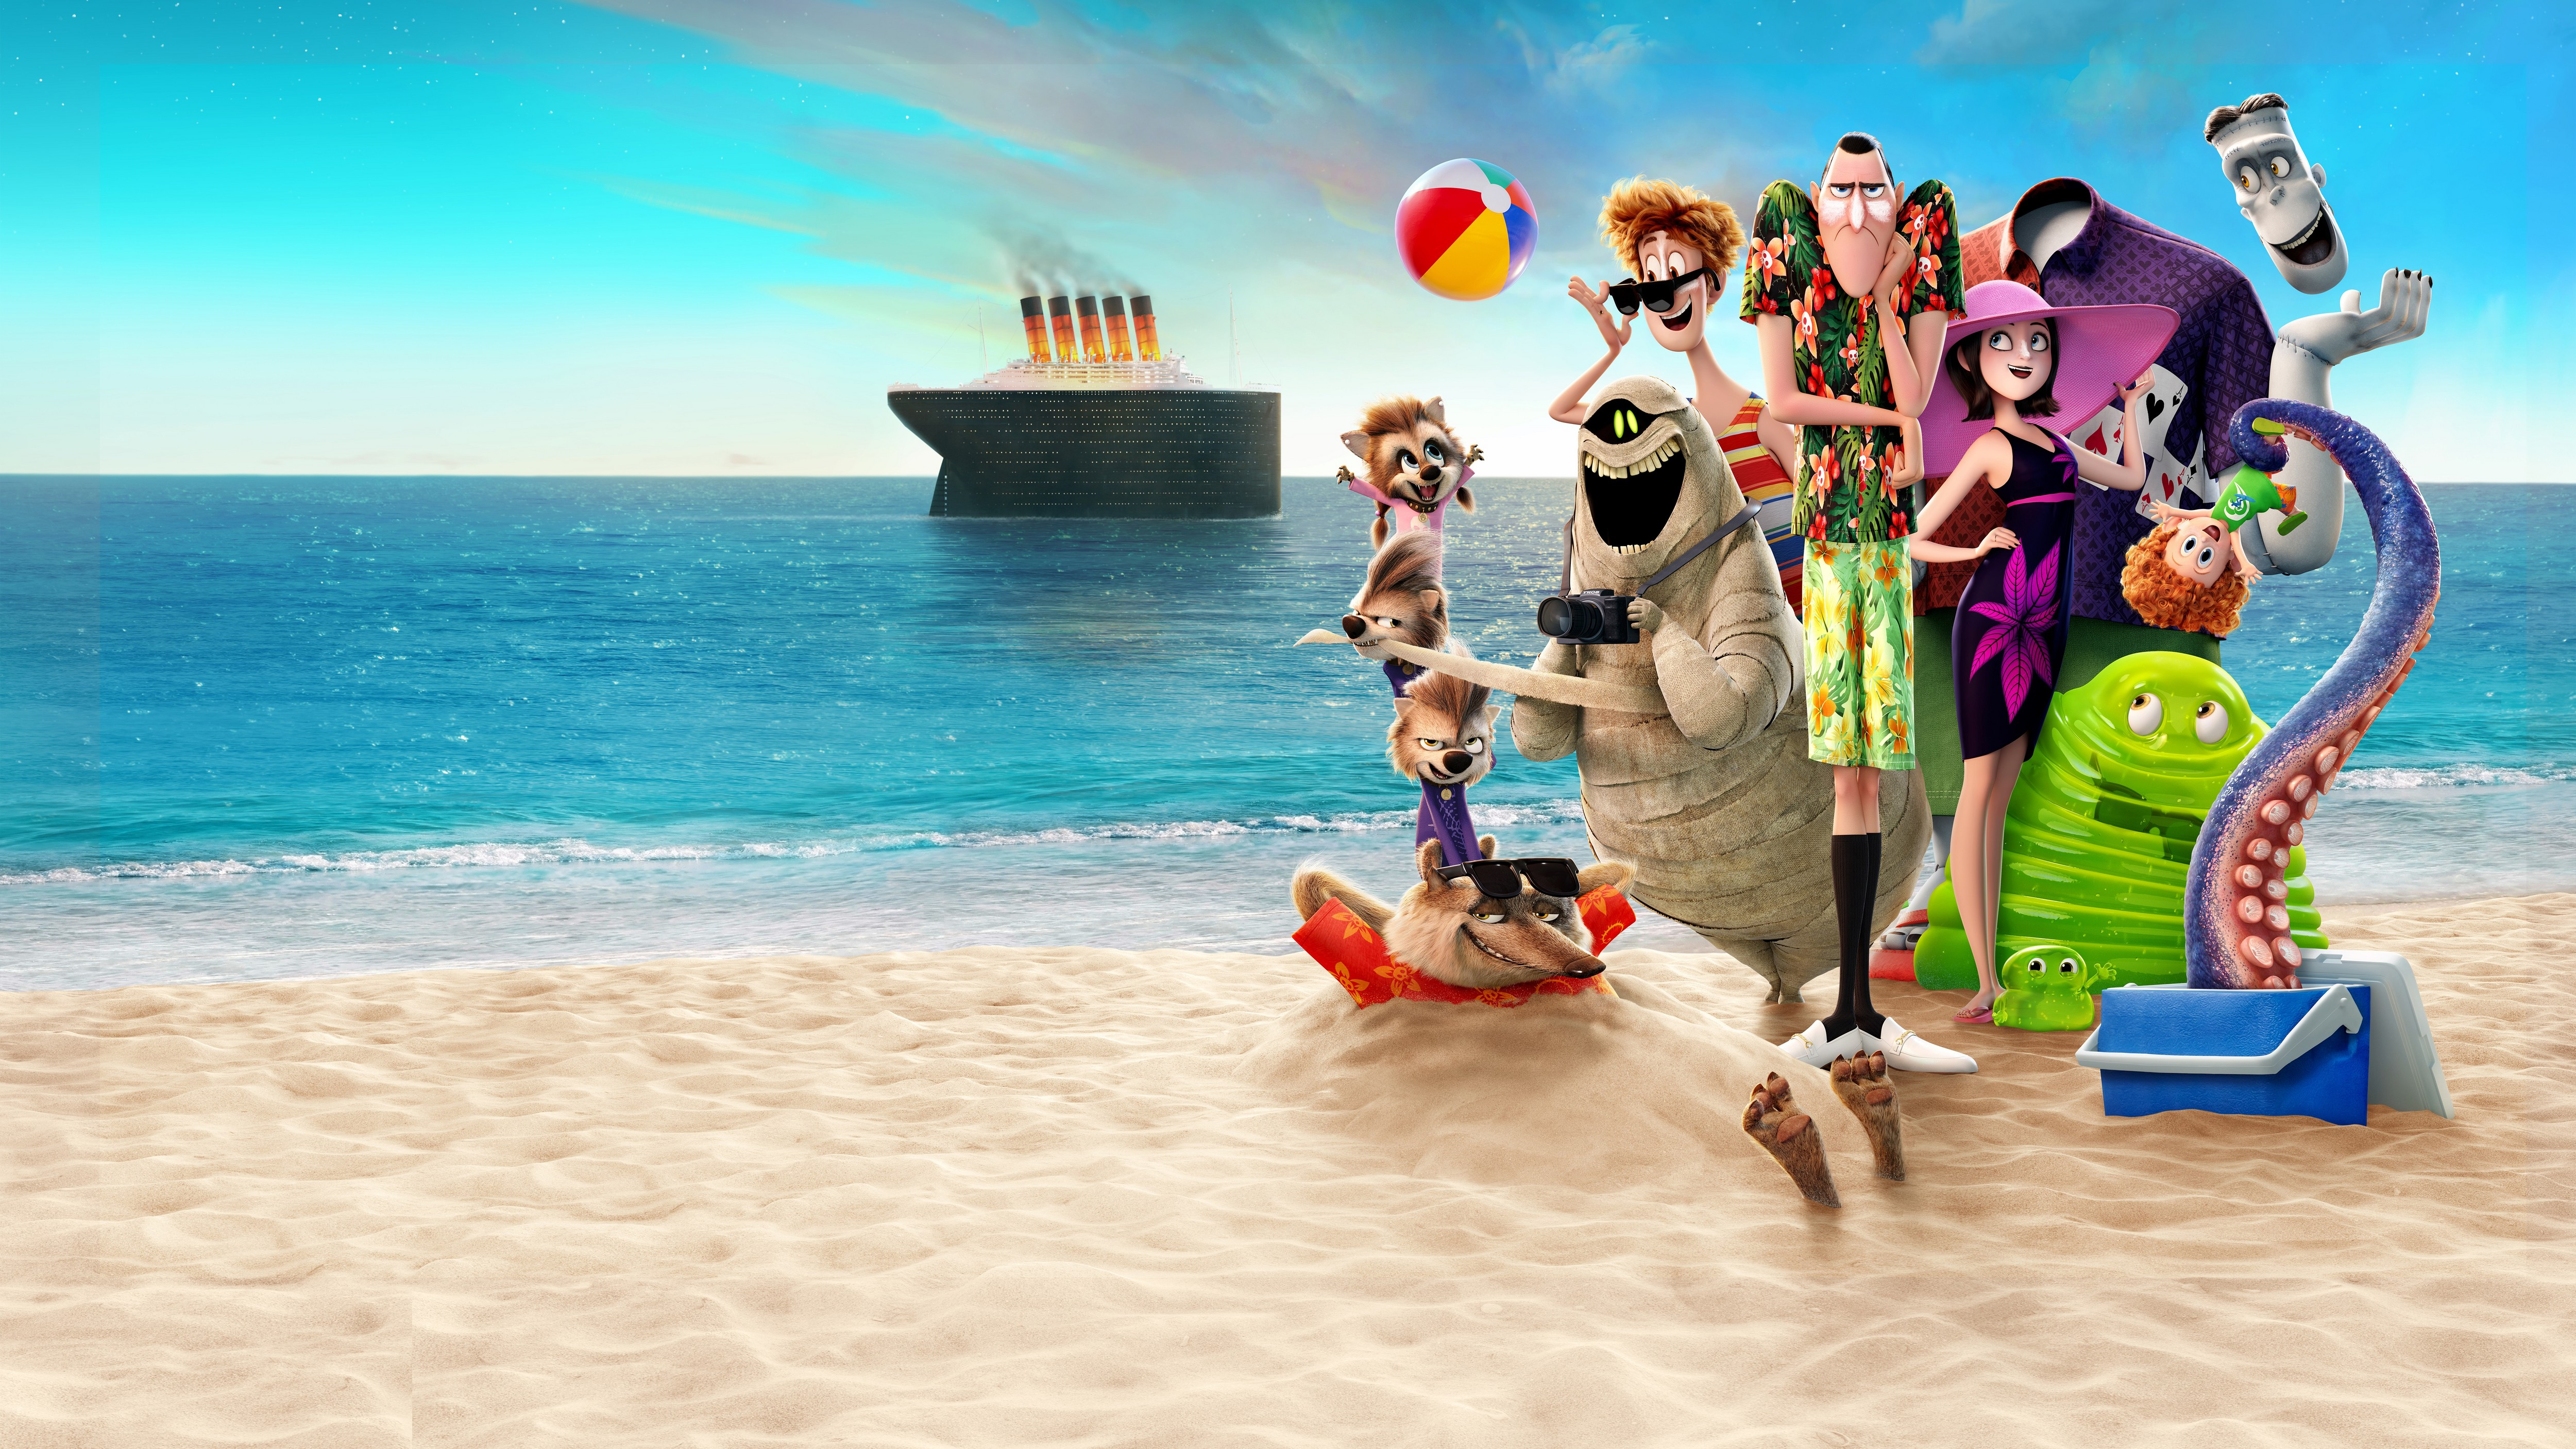 Hotel Transylvania 3: Summer Vacation (English)